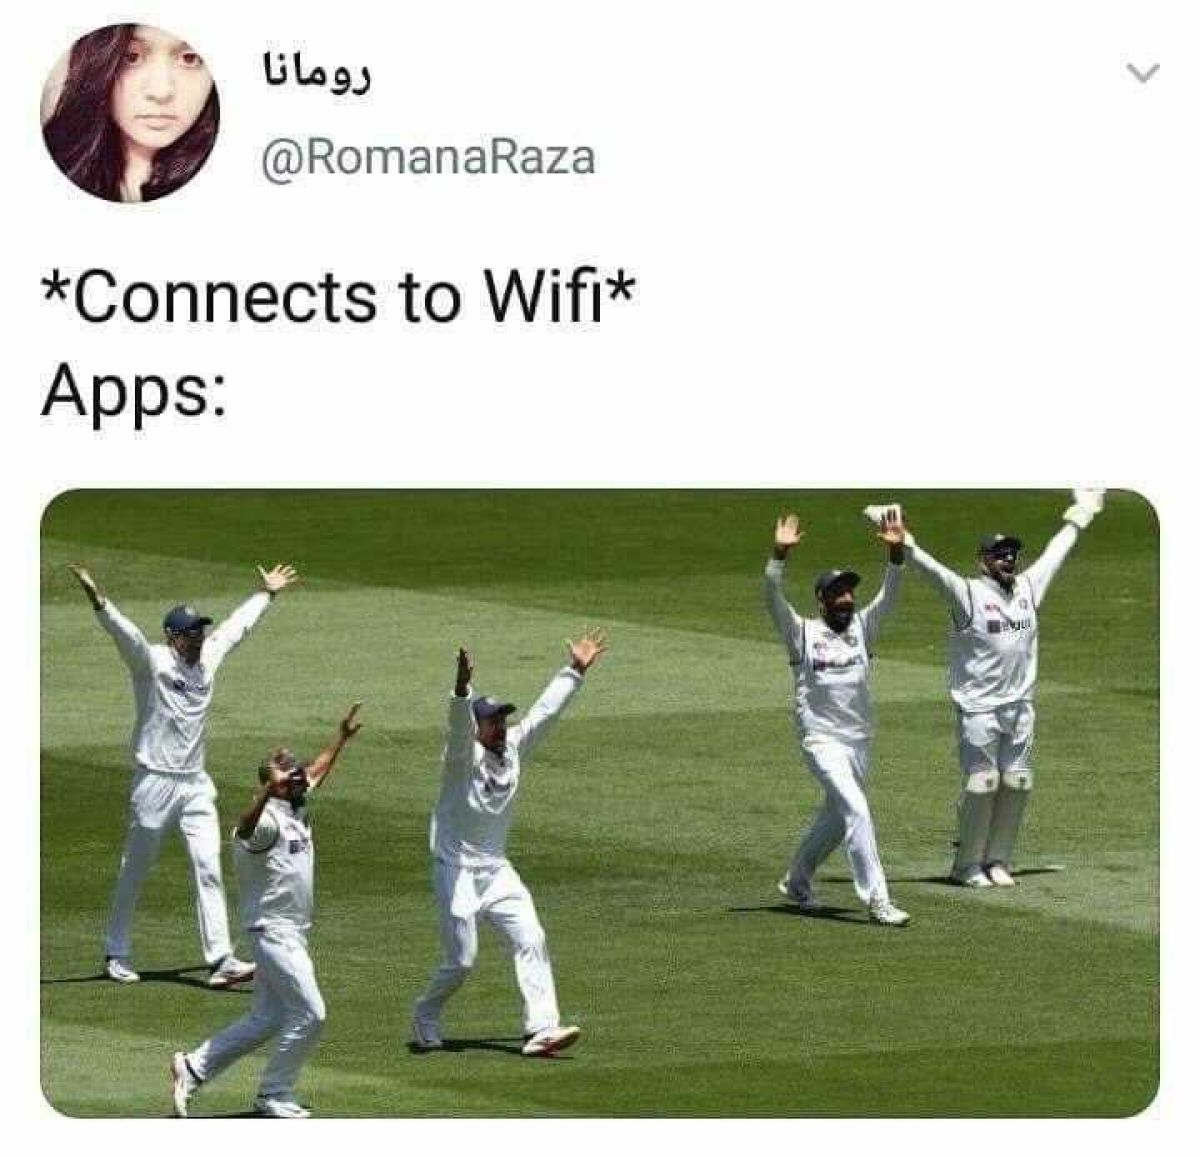 FPJ Fun Corner: Best WhatsApp jokes and memes to lighten your mood amid COVID-19 on December 31, 2020